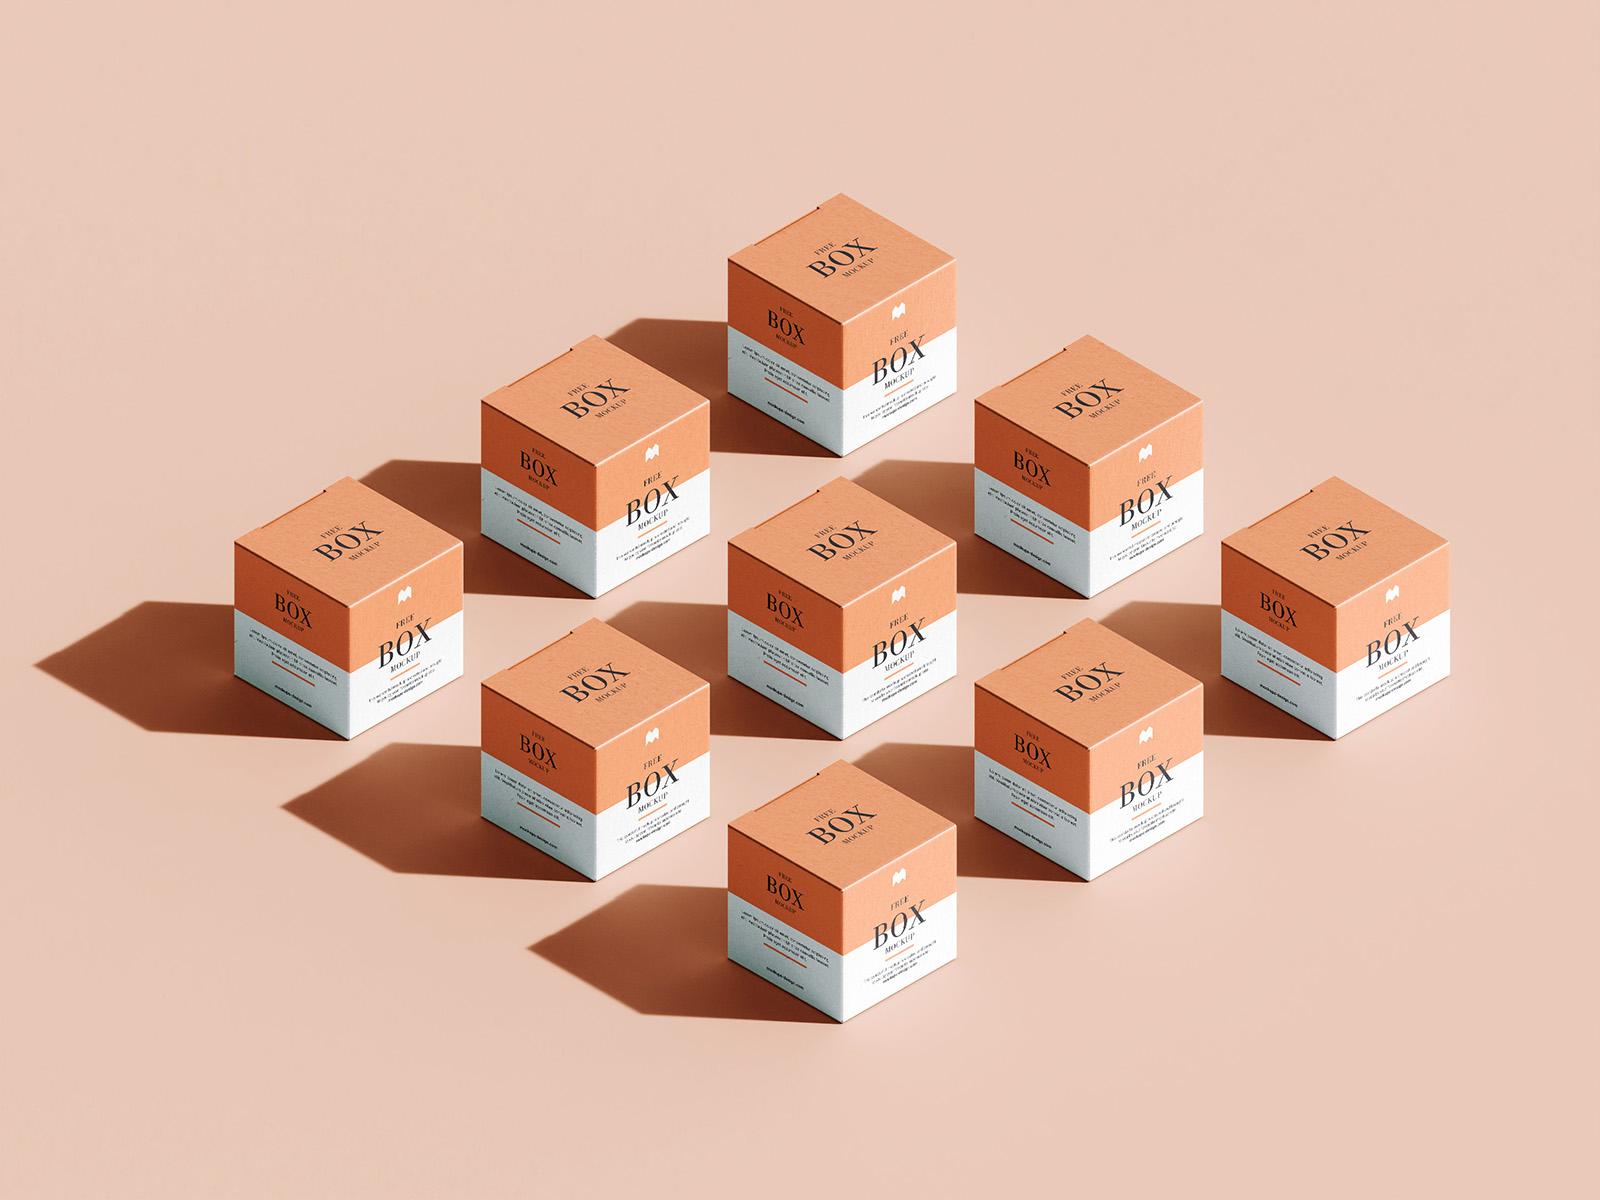 Free box mockup (in grid layout)